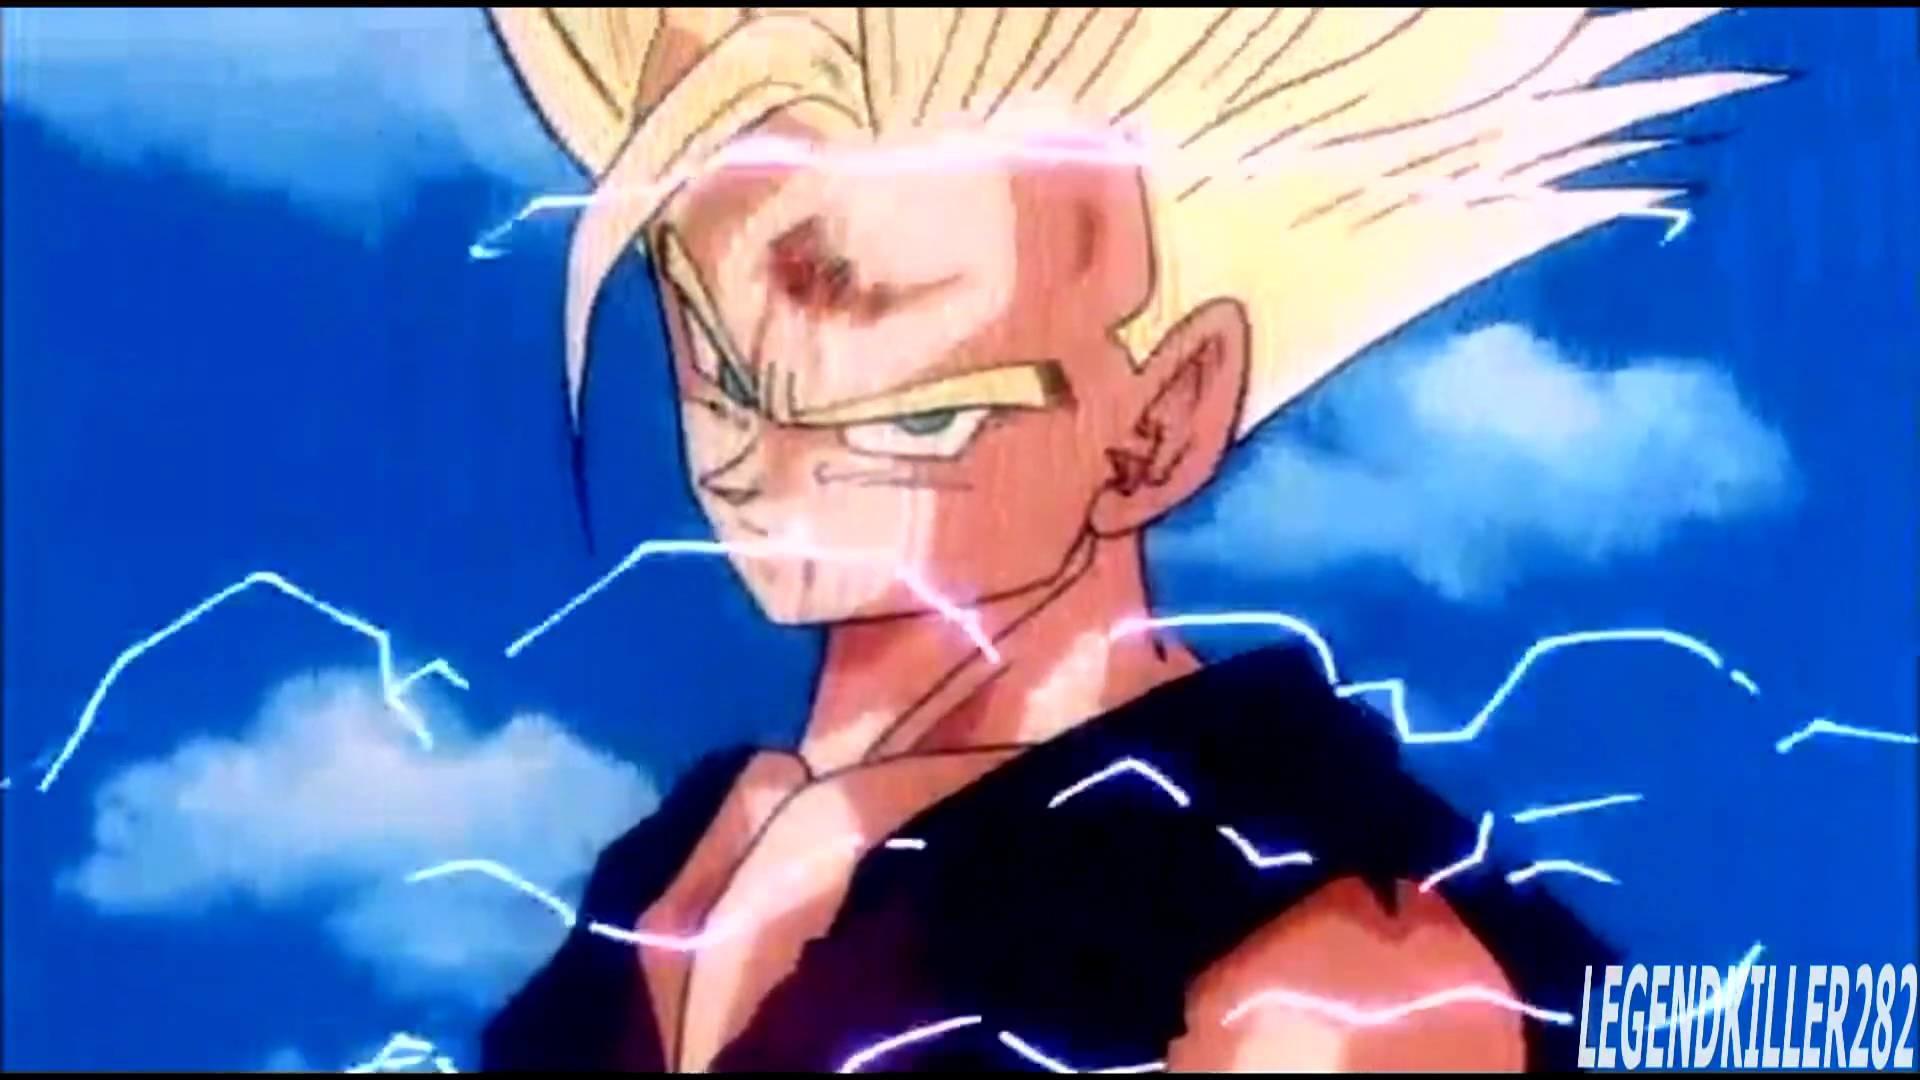 Fat Buu vs Goku/ Vegeta/ Cell/ Gohan